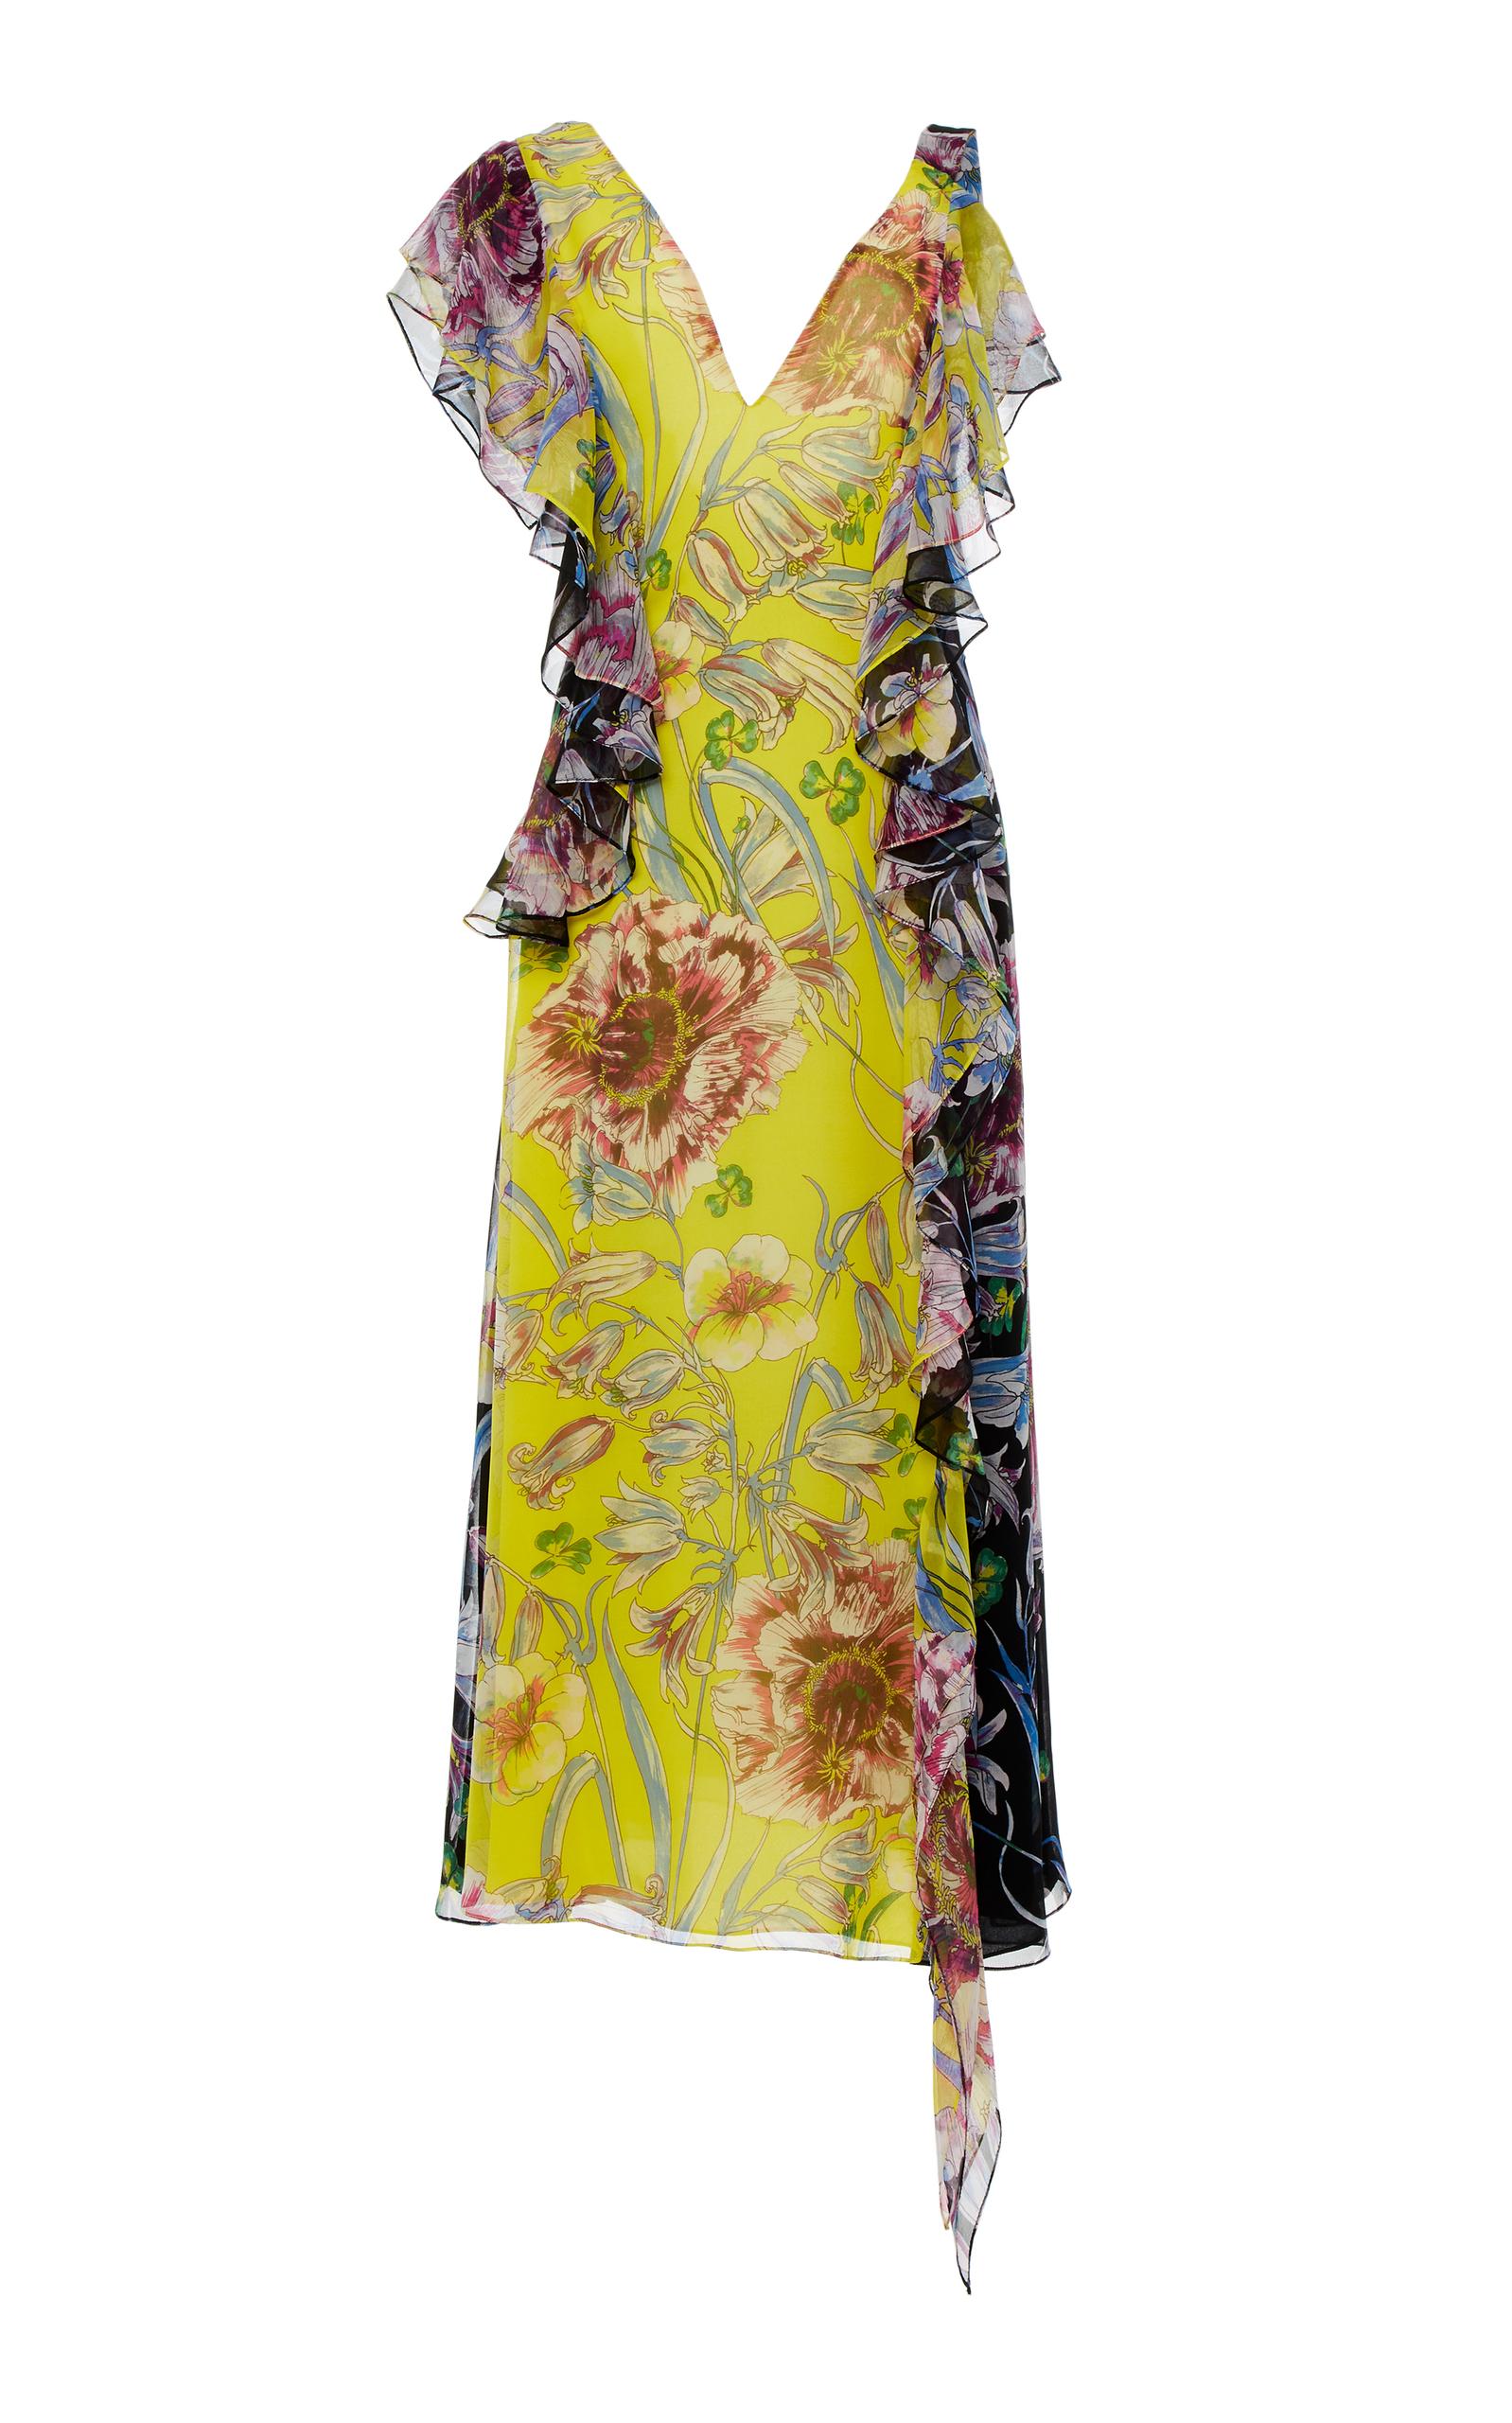 PRABAL GURUNG Rana Floral Silk Dress - Lemon/Black Floral Size 6 in Yellow